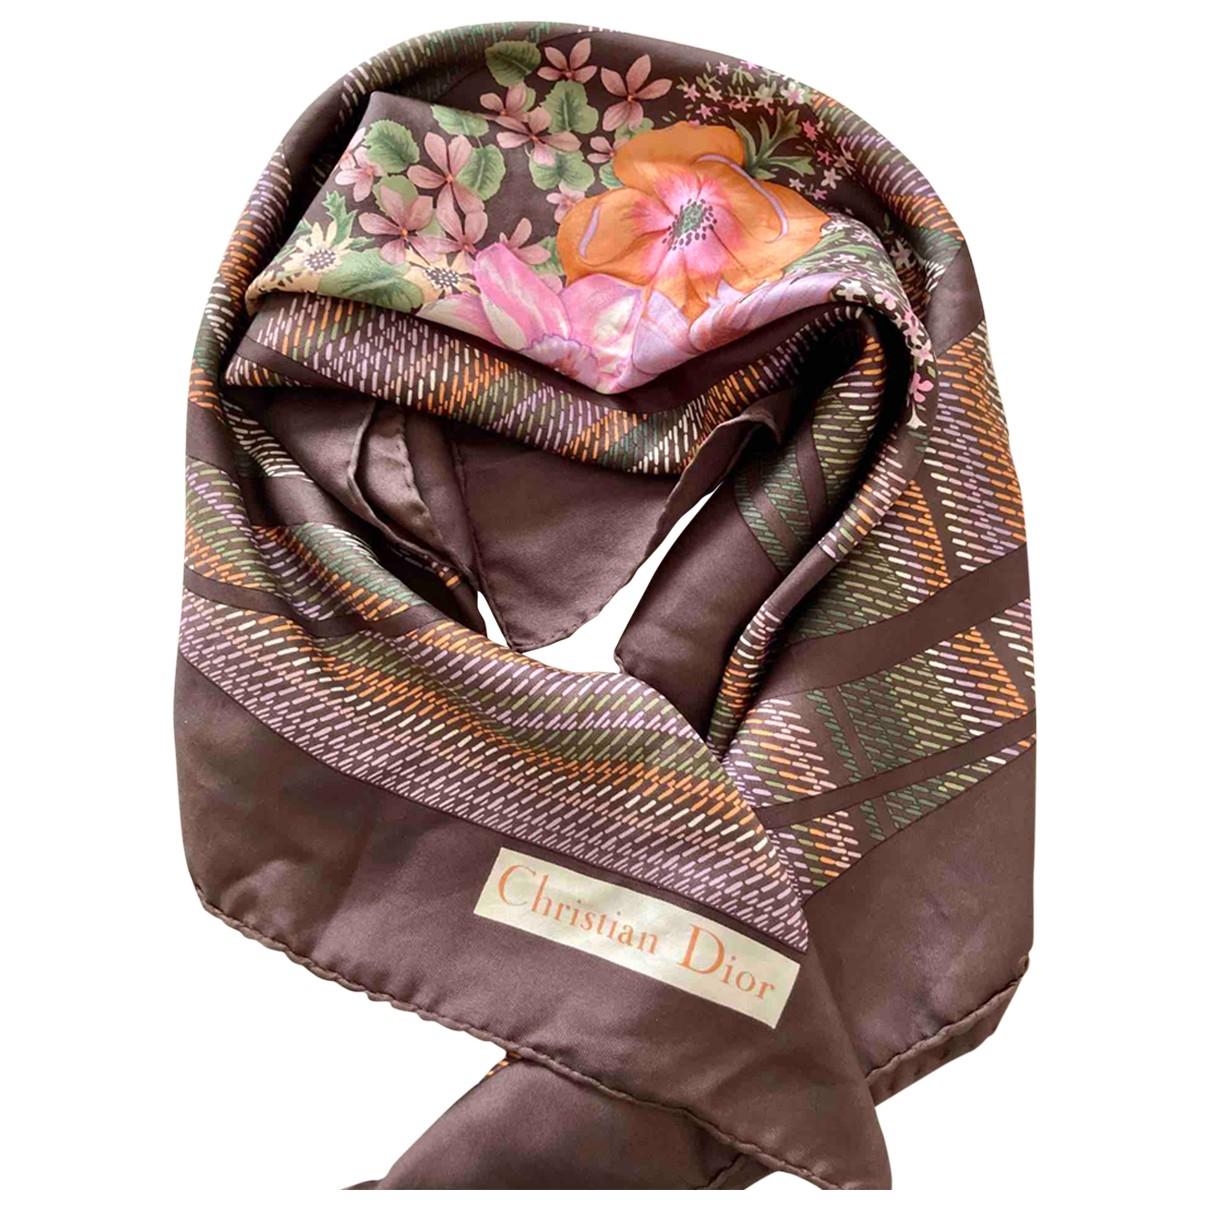 Pañuelo de Seda Christian Dior